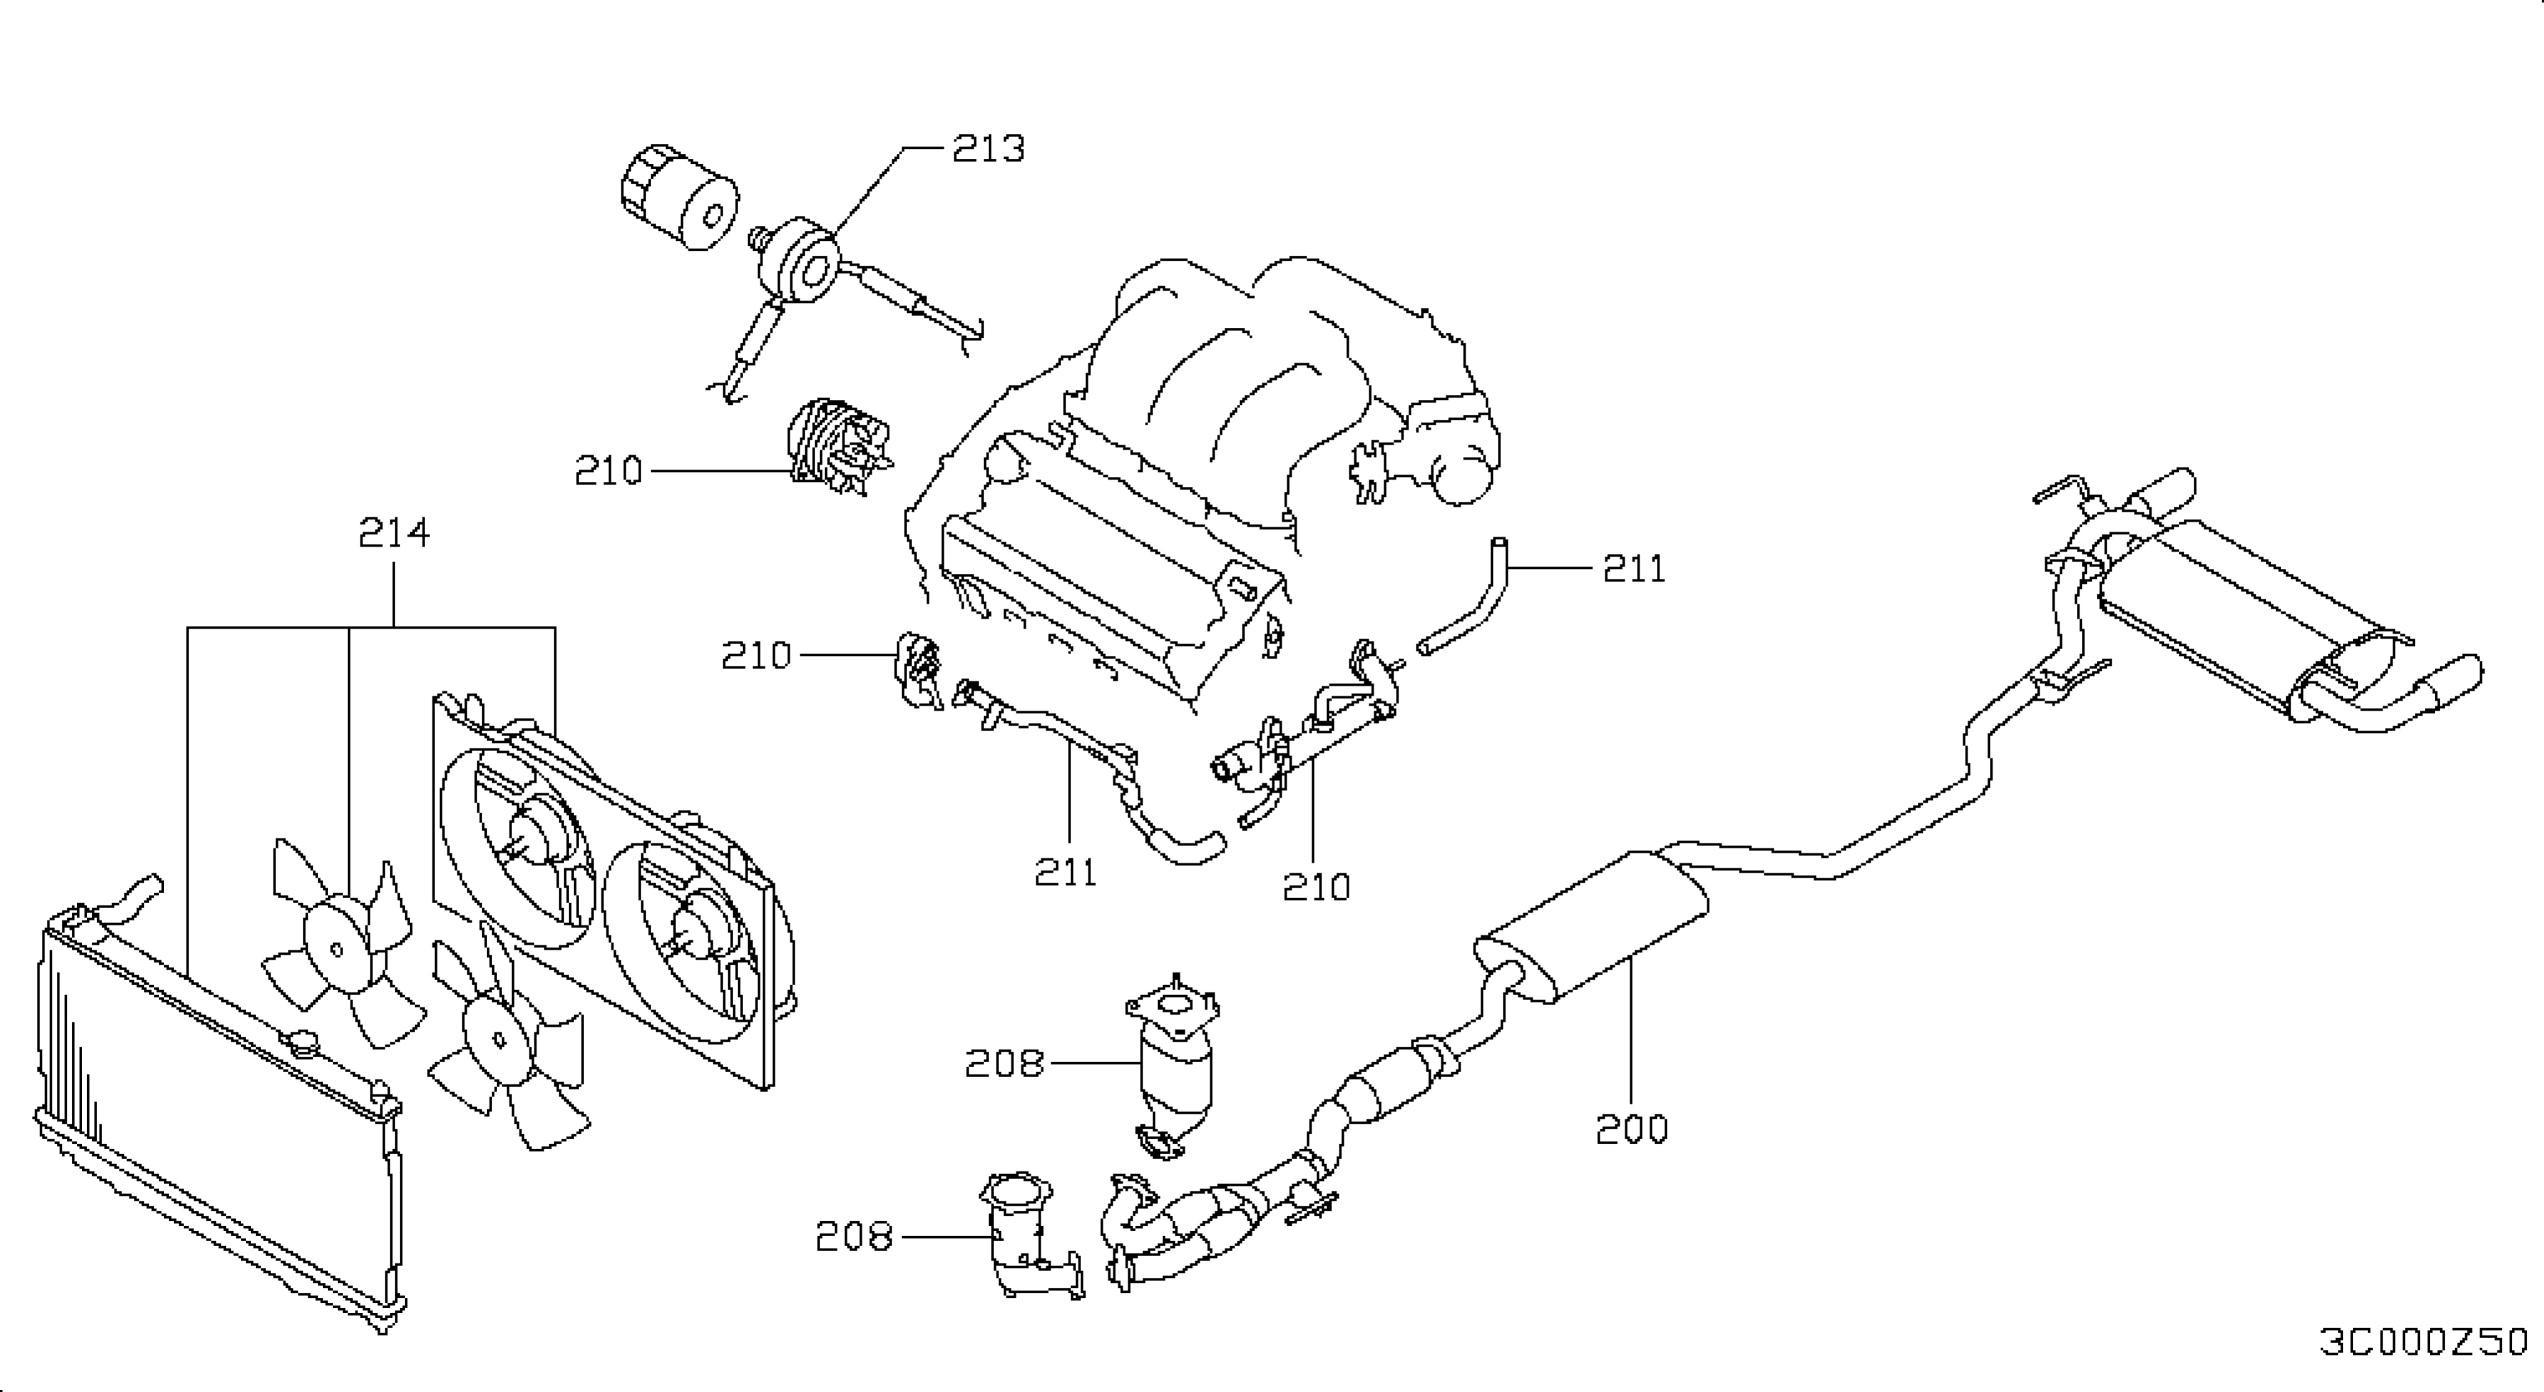 2004 Nissan Altima Engine Diagram Wiring Library 2002 Murano Oem Parts Usa Estore